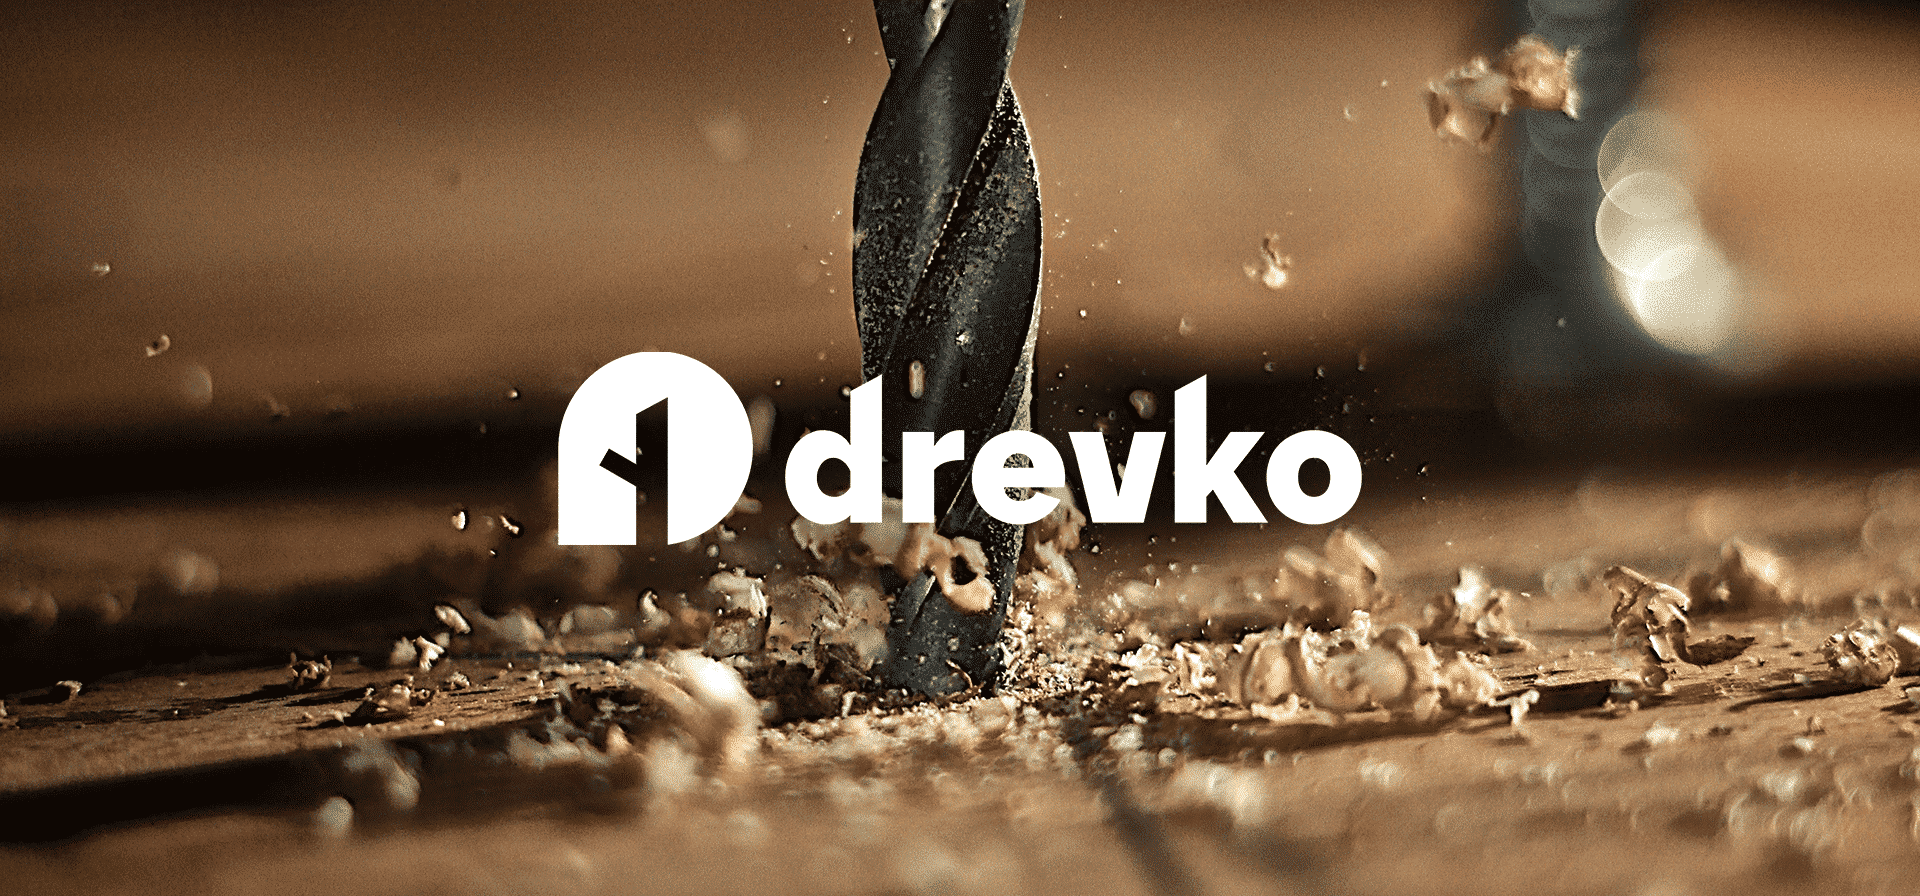 Drevko Logo